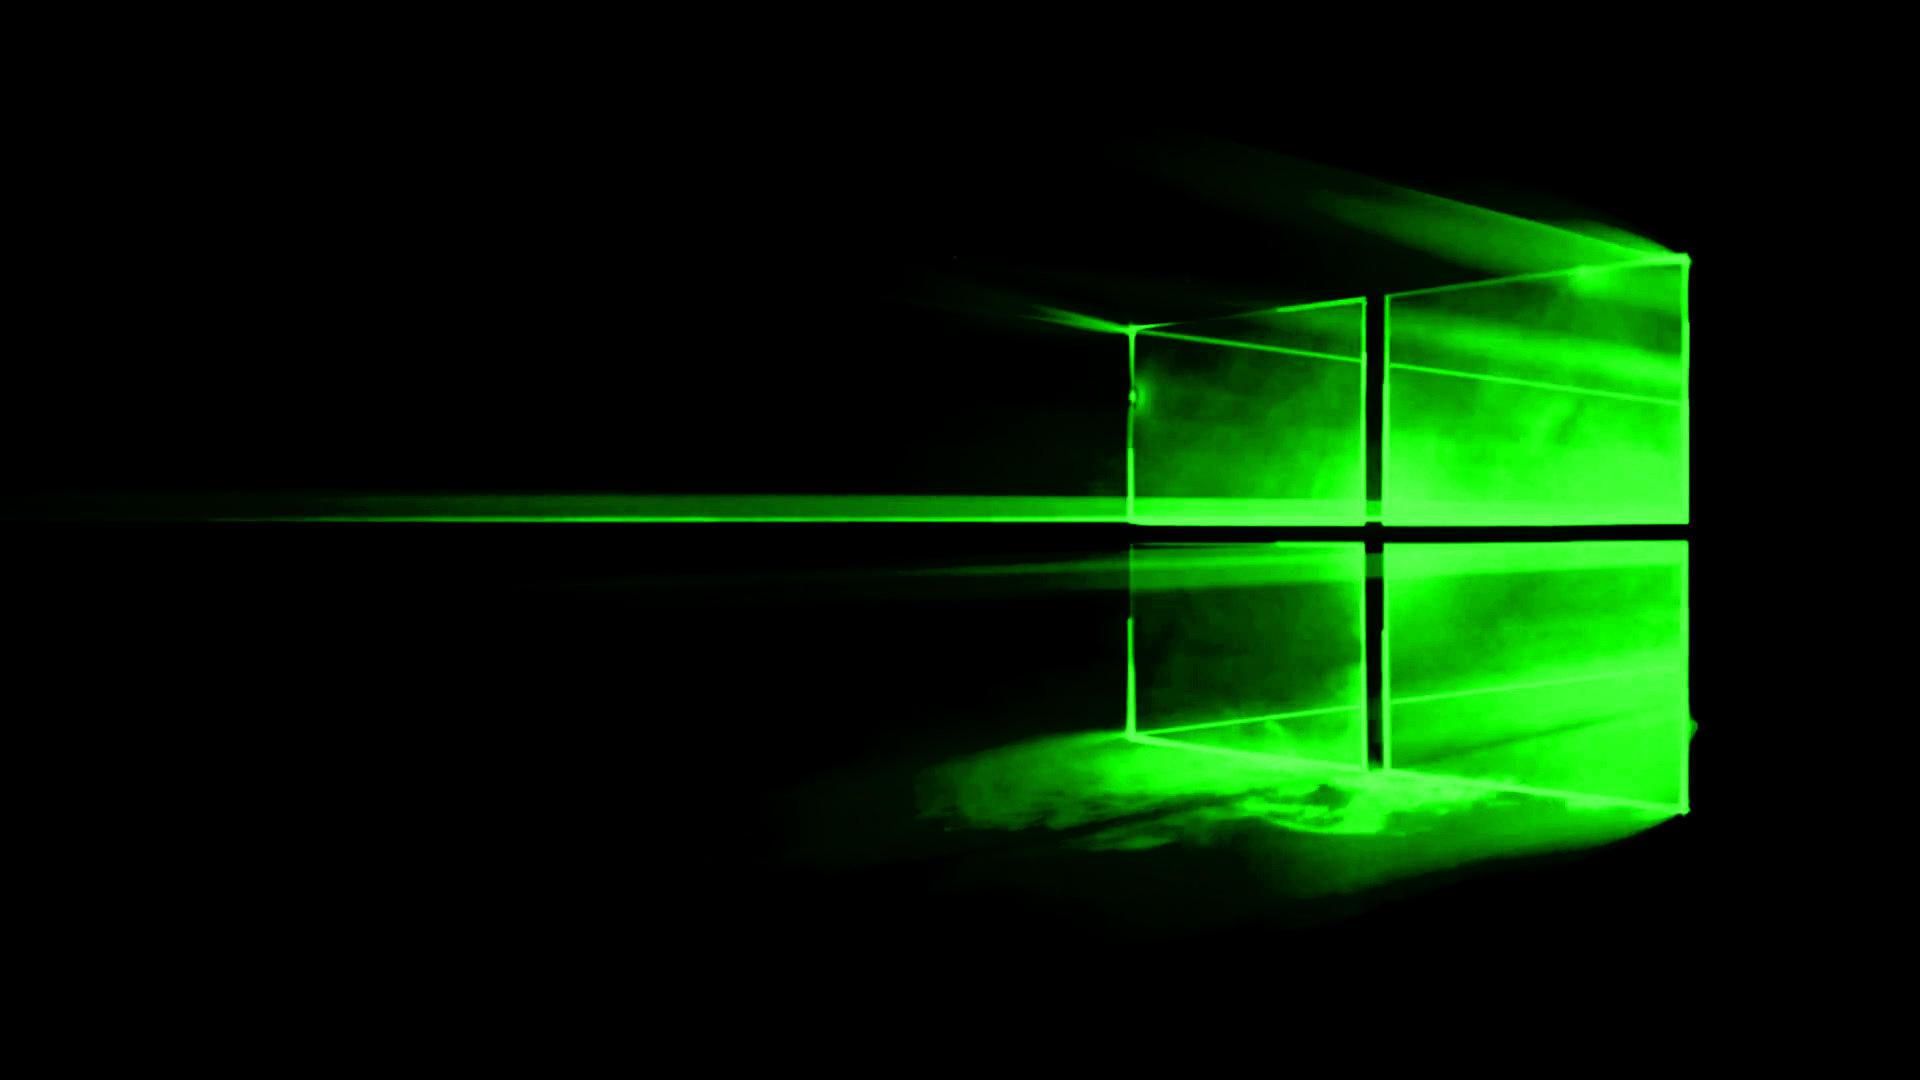 Windows 10 Wallpapers: Windows 10 Green Wallpaper (71+ Images